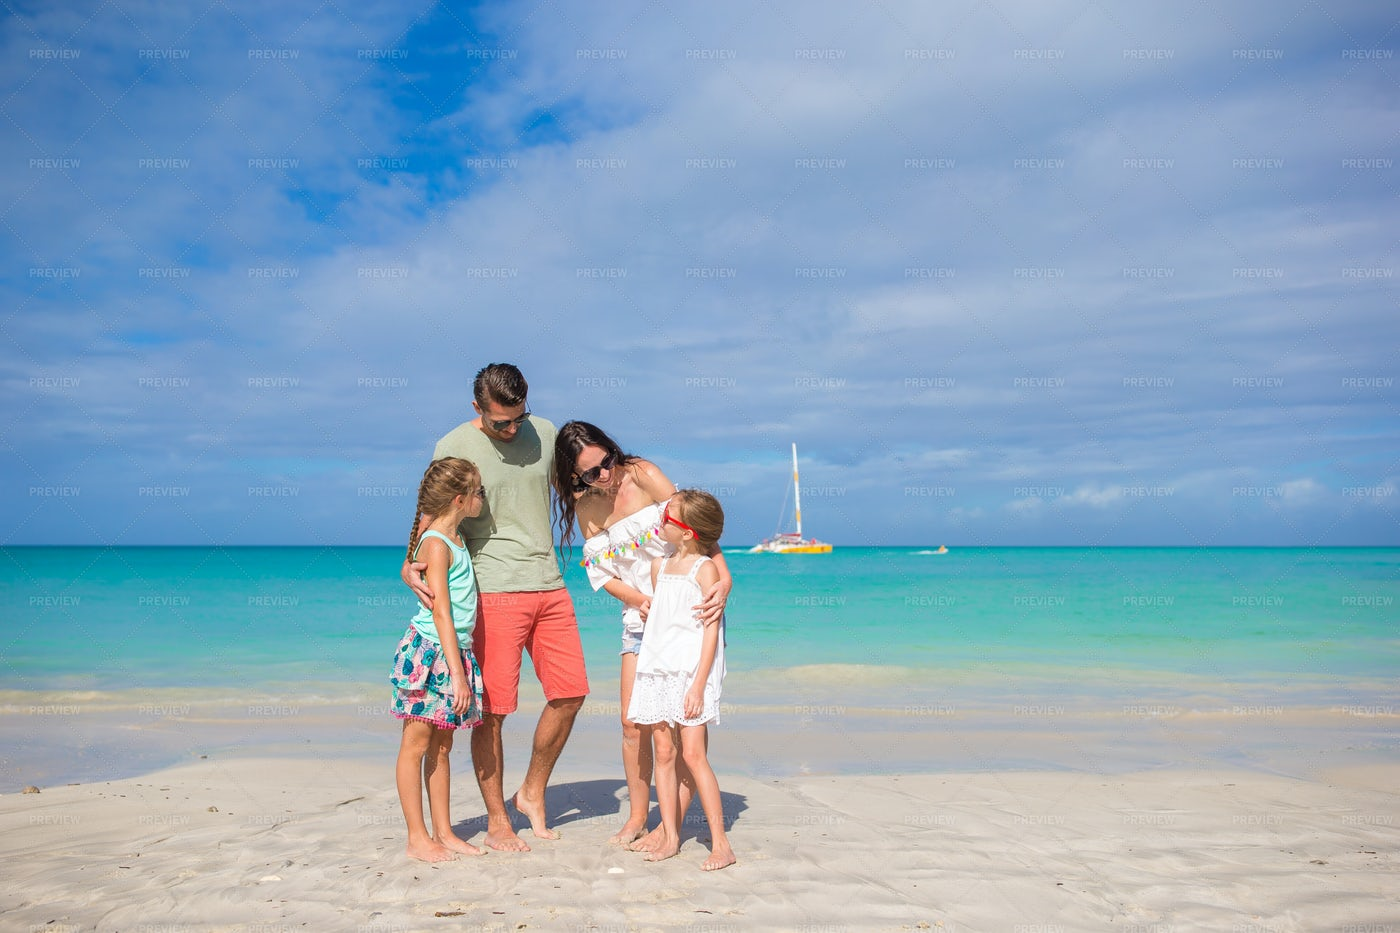 Family On Beach Vacation: Stock Photos